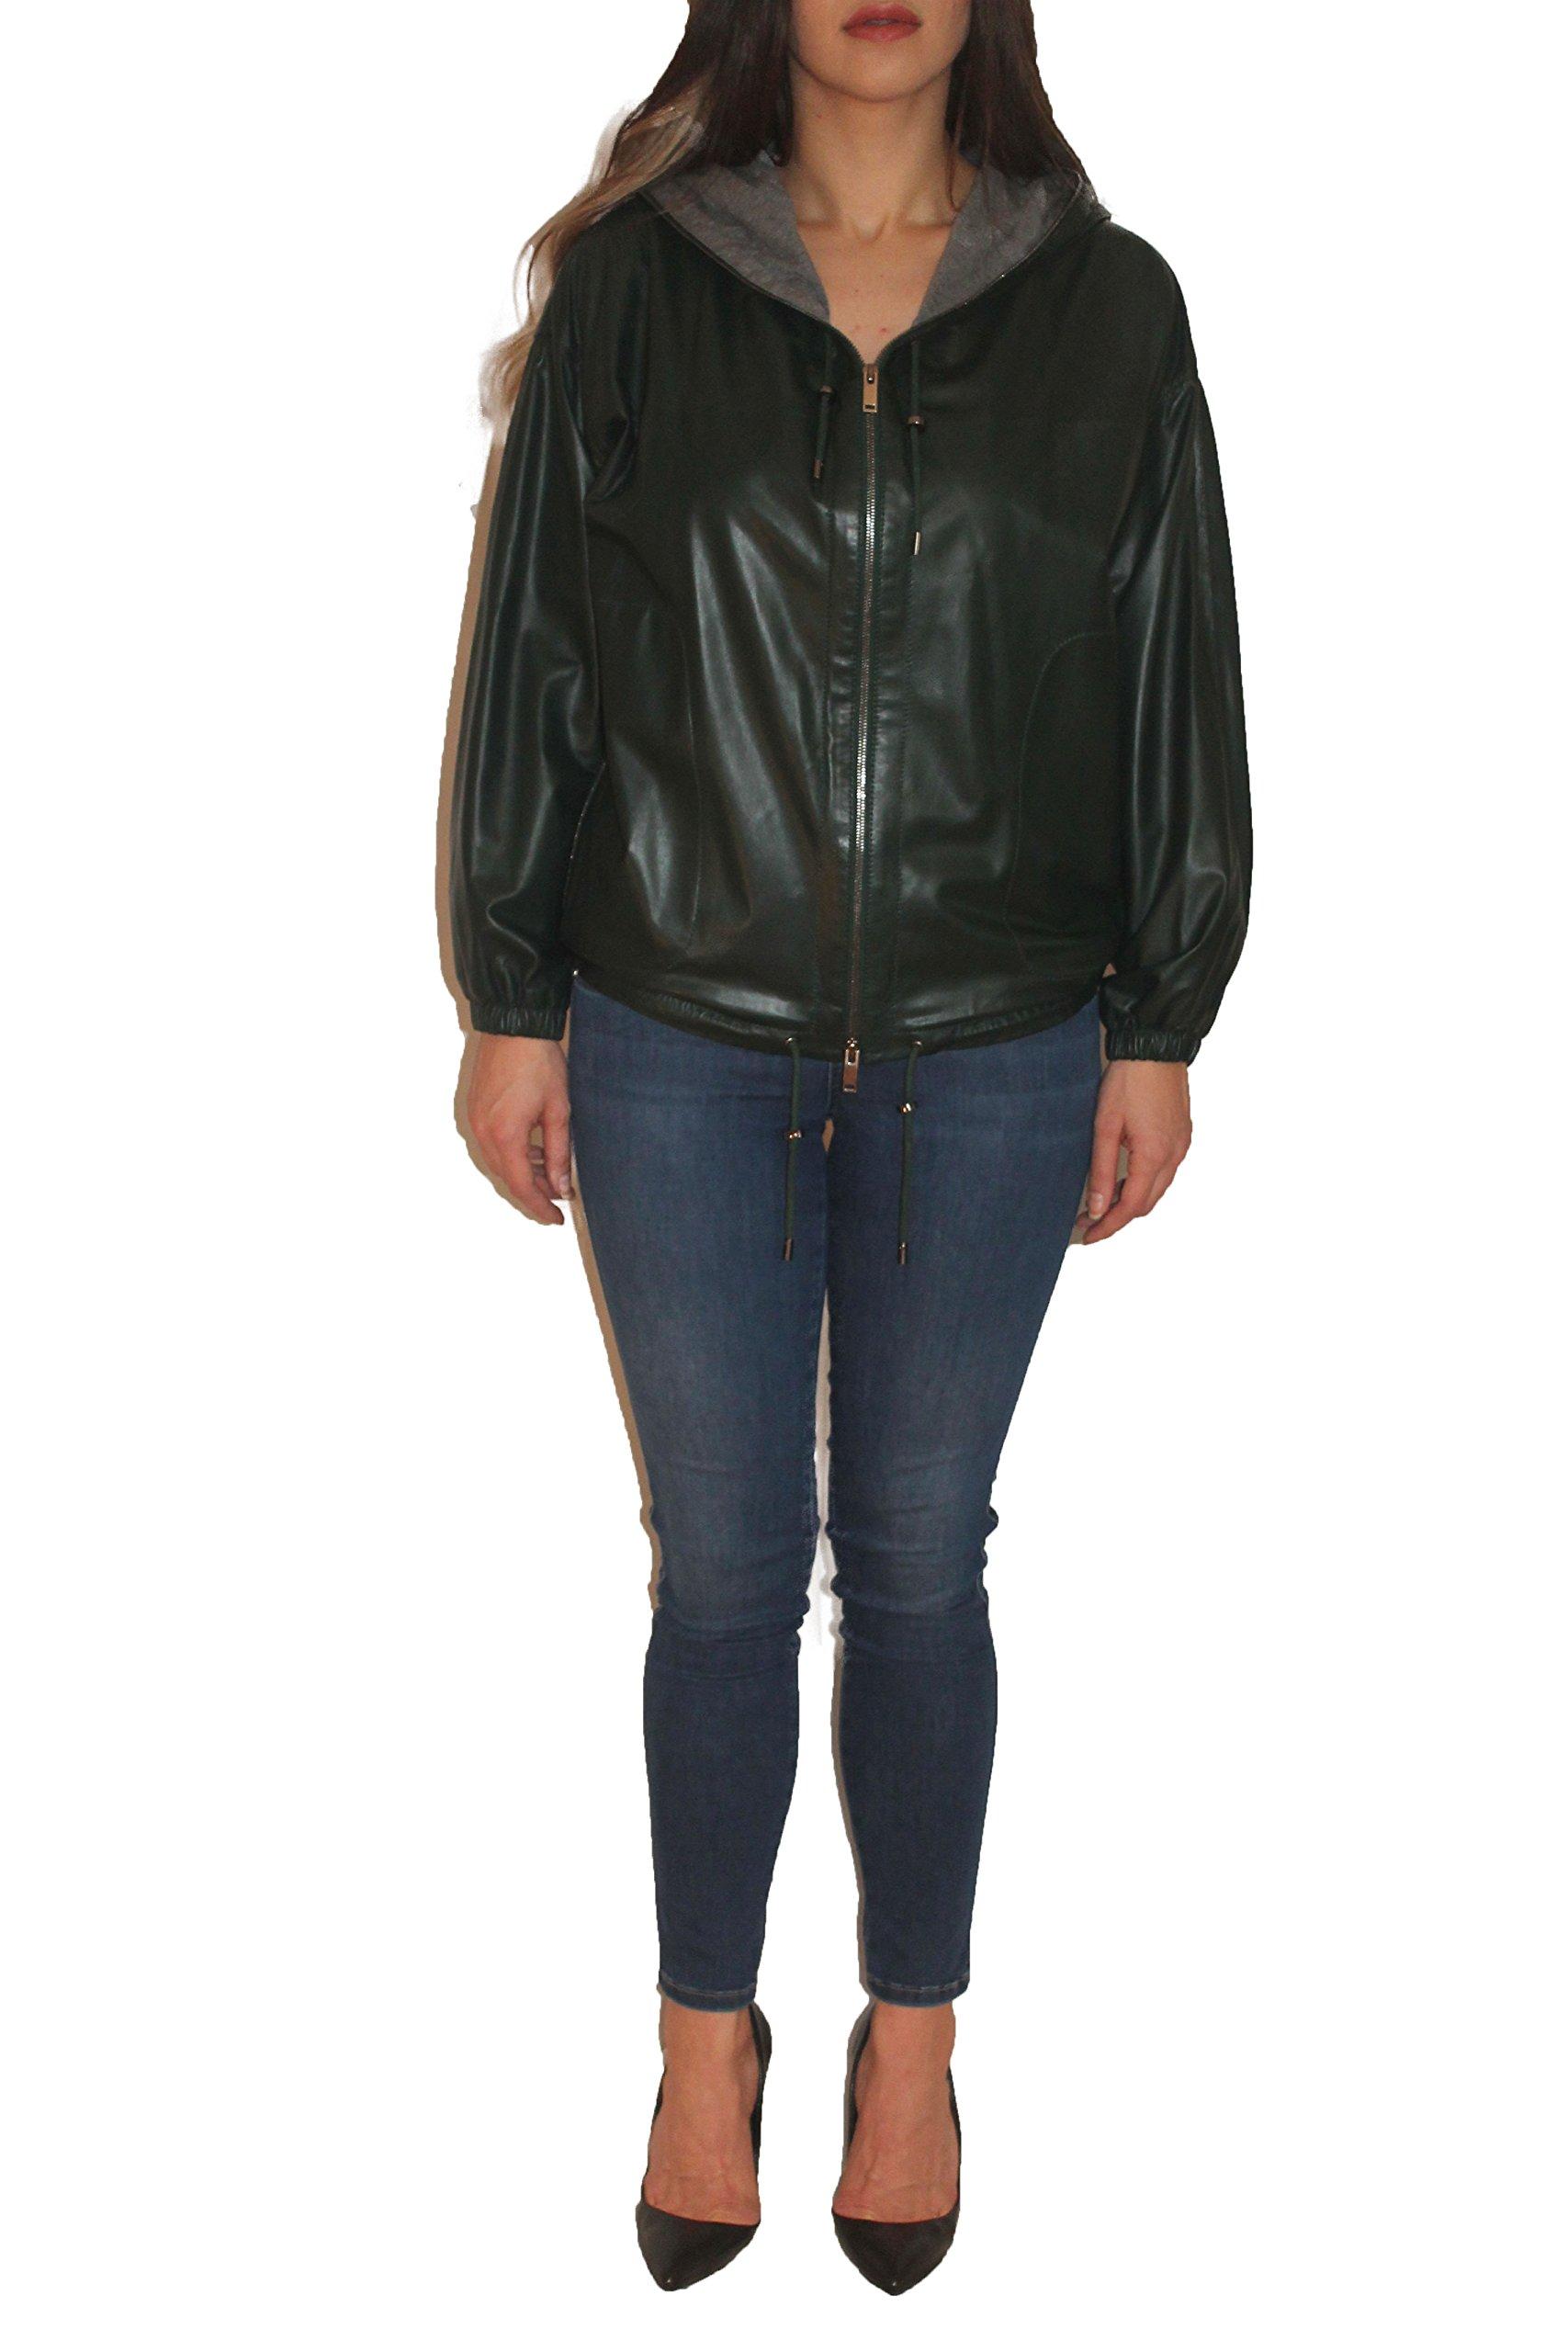 Mia, Genuine Sheep Leather Bomber Jacket (Green, Medium)